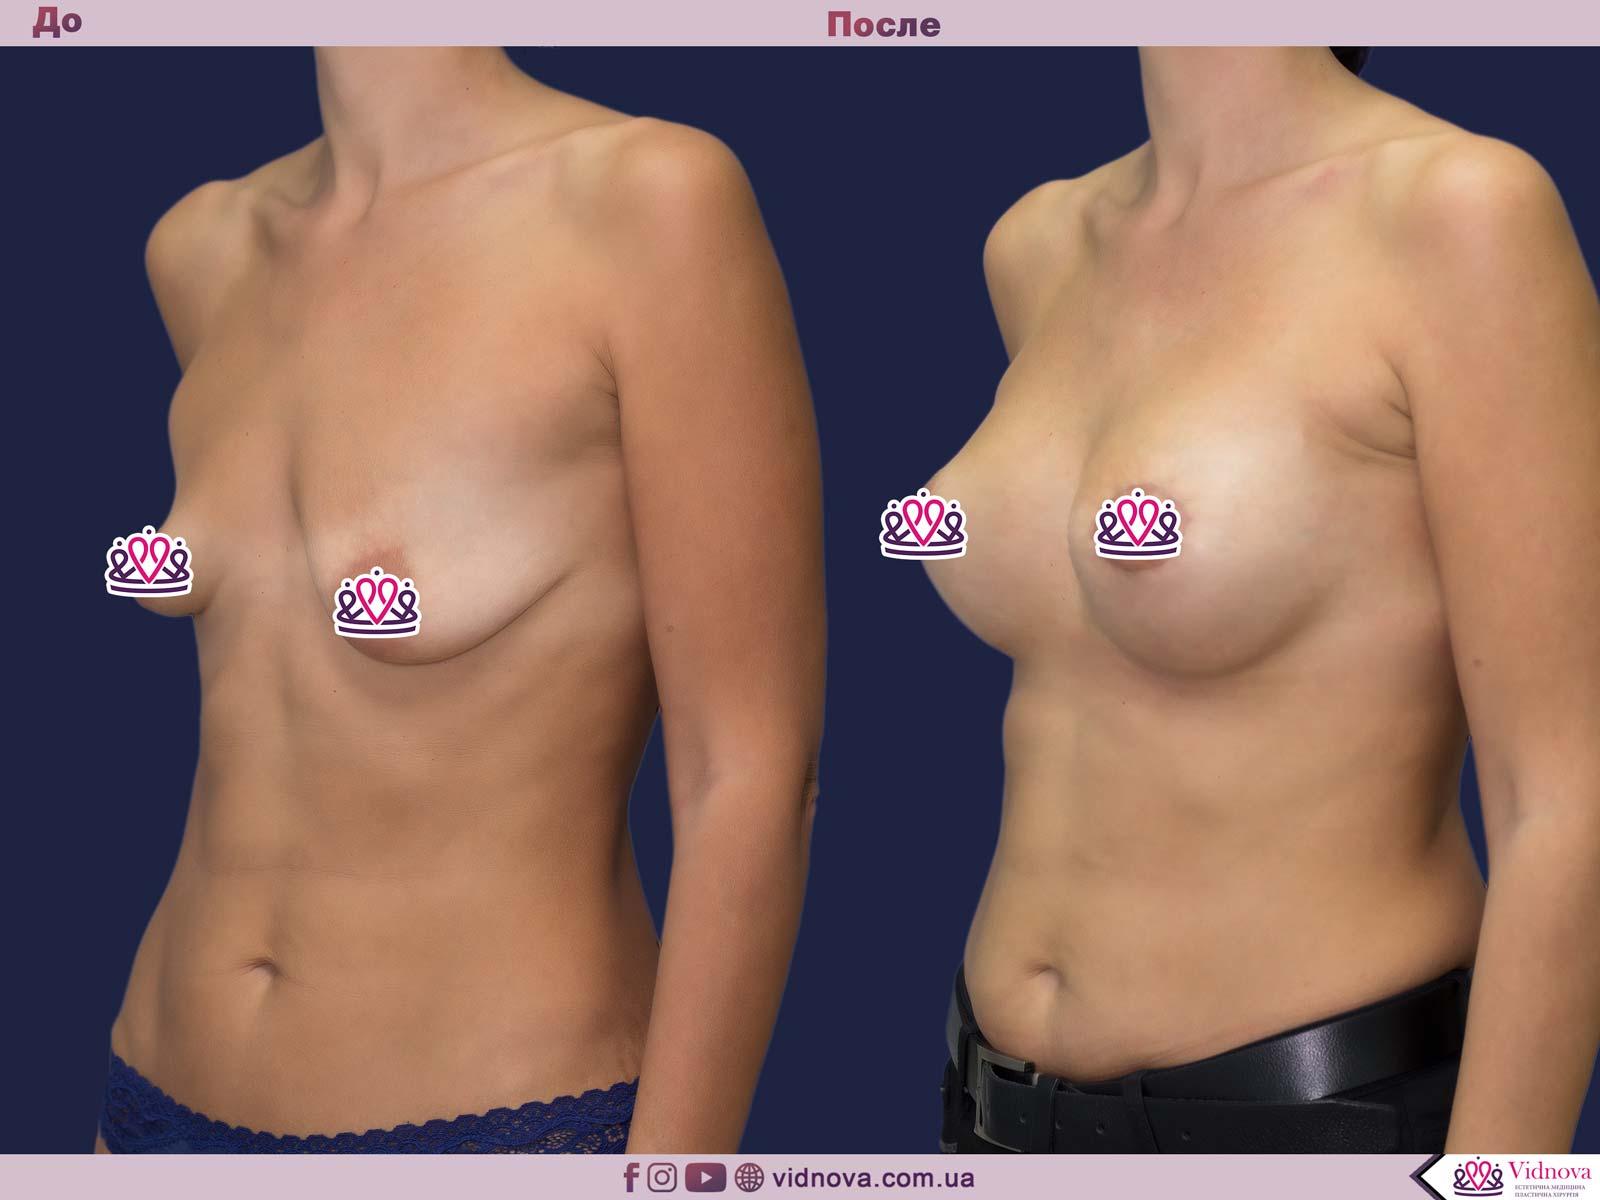 Увеличение груди: Фото ДО и ПОСЛЕ - Пример №74-2 - Клиника Vidnova